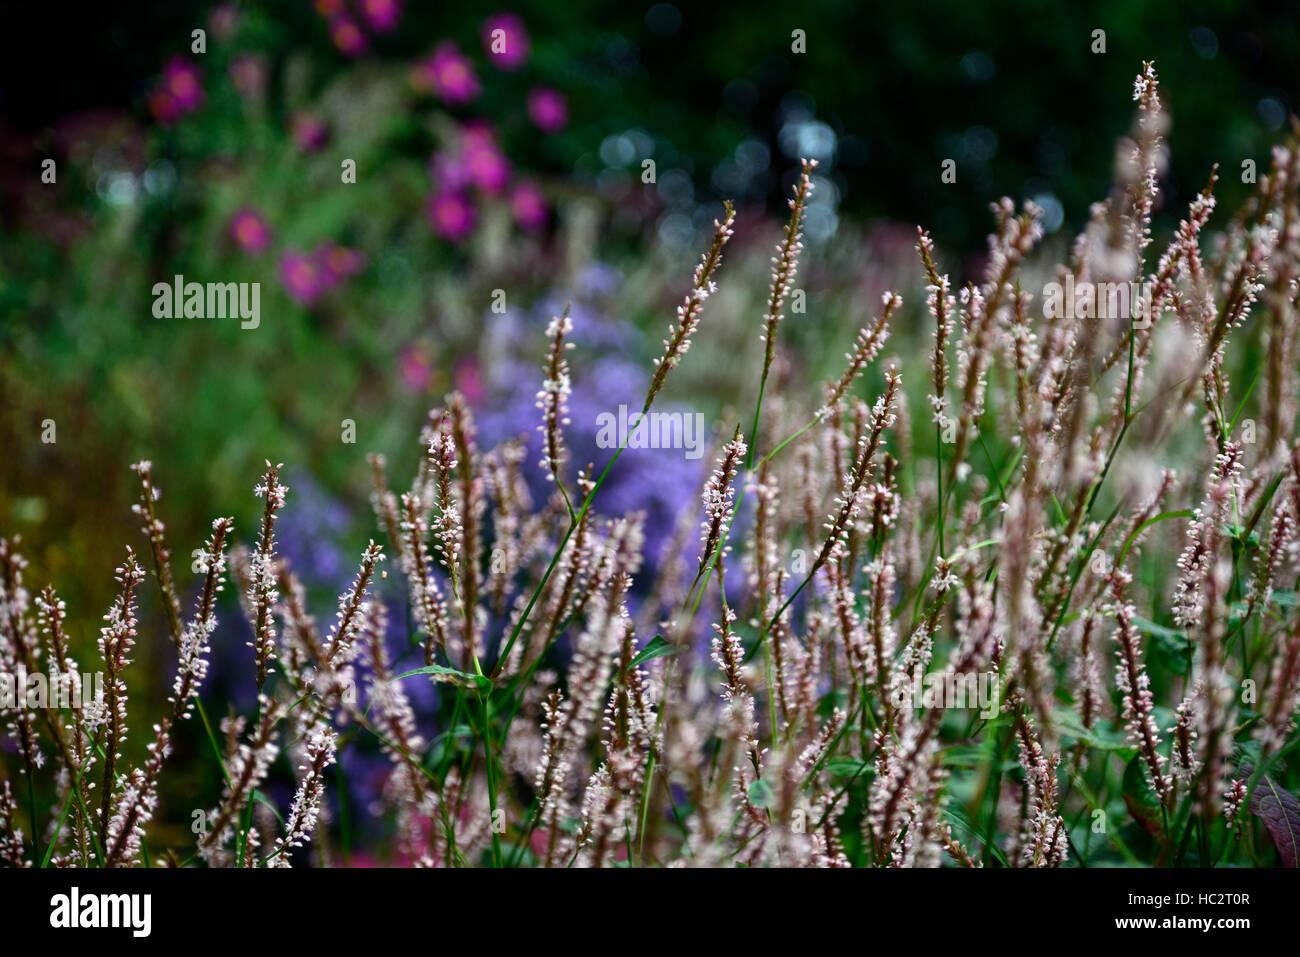 Persicaria Amplexicaulis Alba White Perennial Perennials Flower